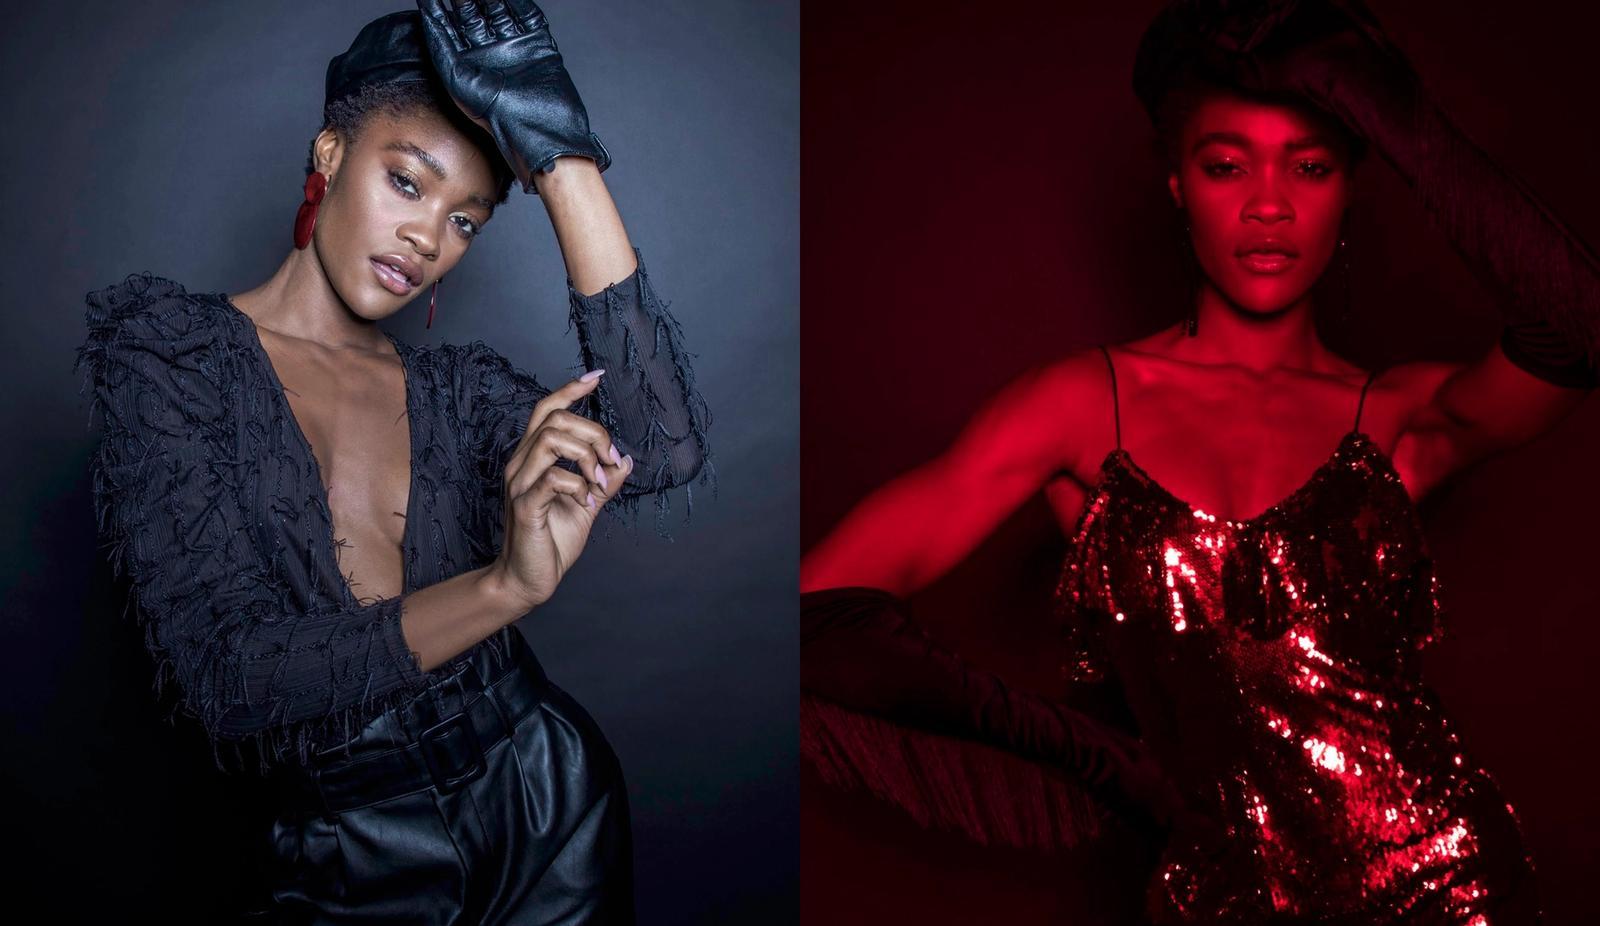 Stylist: Anita Johnson, Photographer: Yi Jeat, Model: LaSha